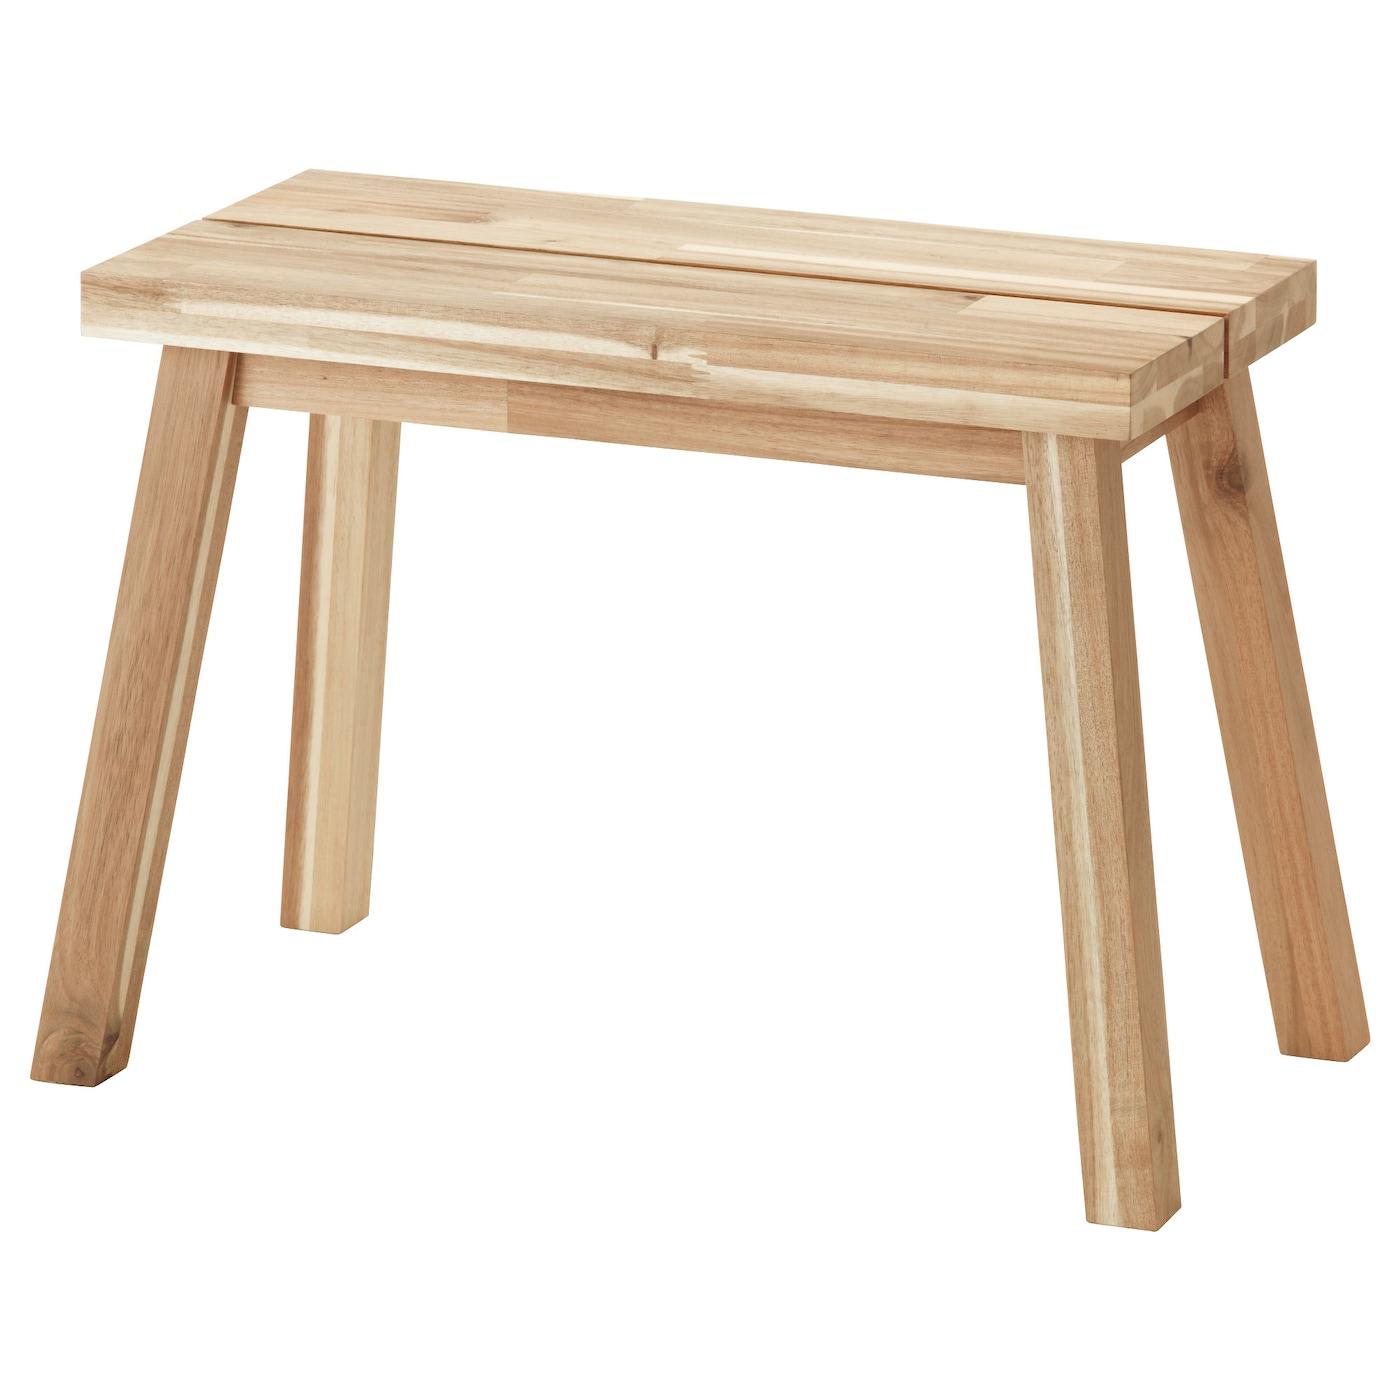 Skogsta Banc Acacia 60 Cm Ikea # Banc En Bois Massif